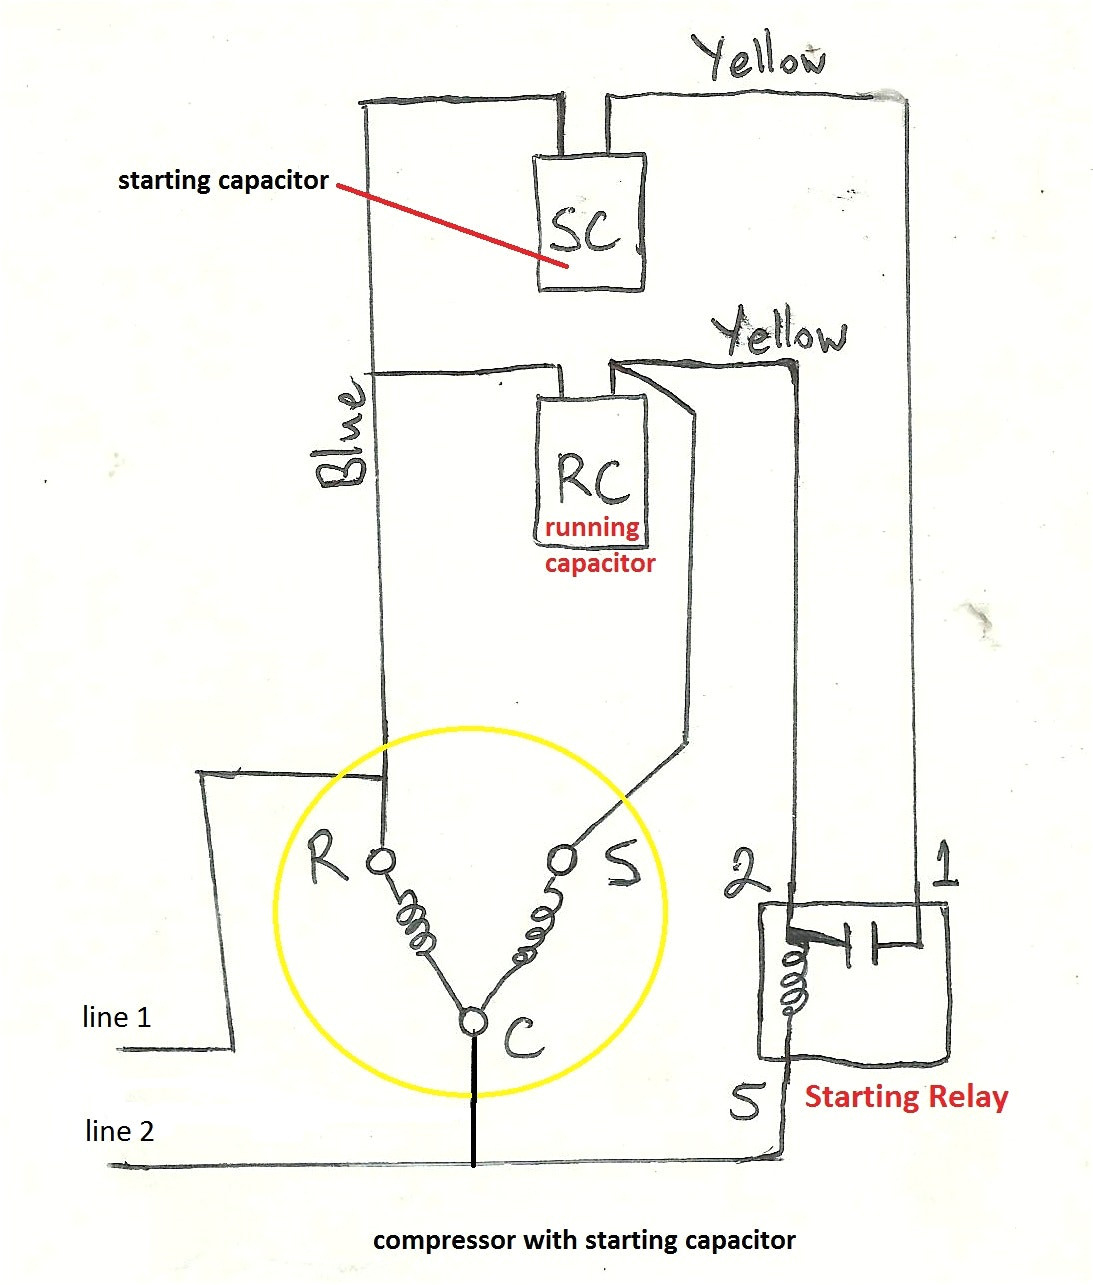 Ceiling Fan Internal Wiring Schematic | Best Wiring Library - Ceiling Fan Internal Wiring Diagram